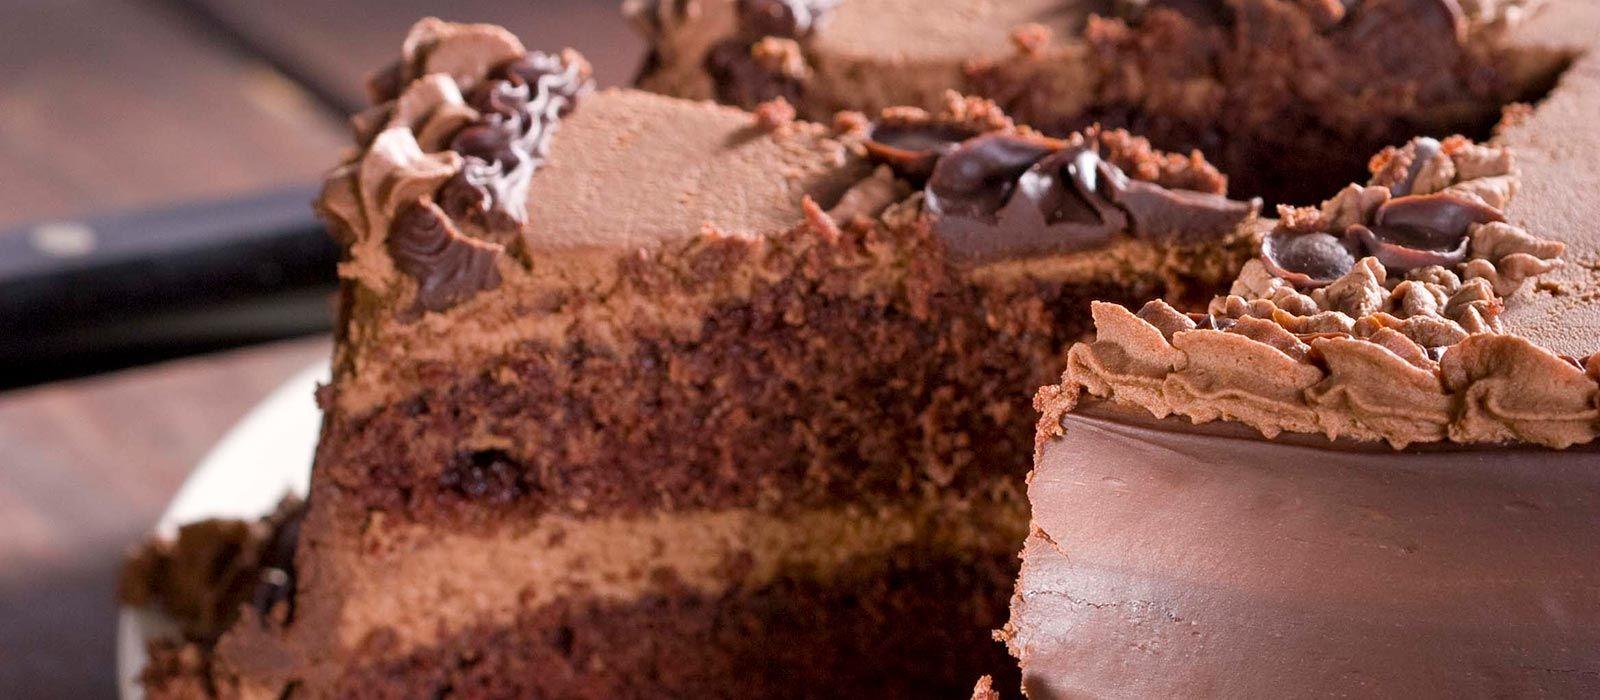 New Pi Chocolate Mousse Cake